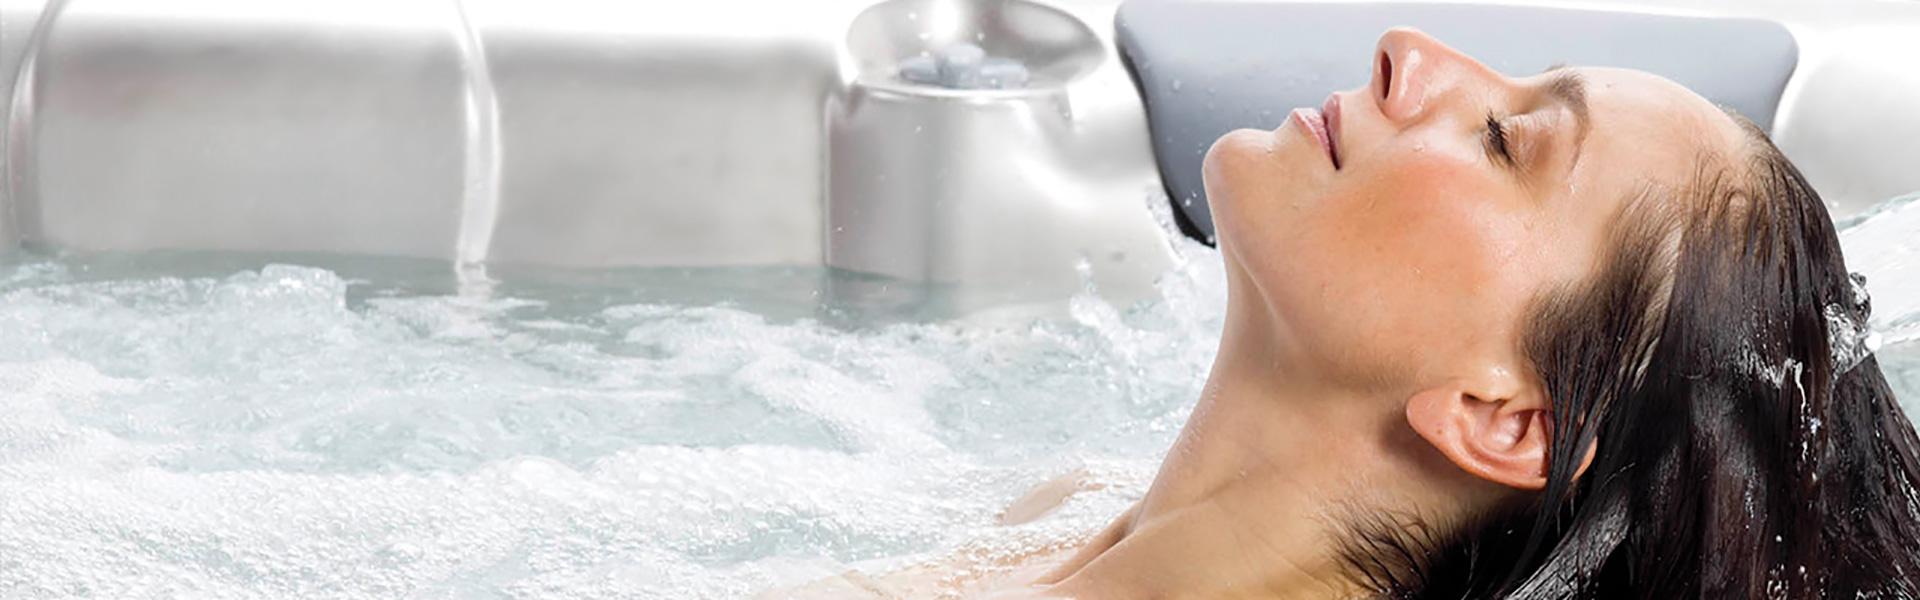 Relieve Arthritis Pain in a Backyard Spa – Hot Tubs Ballwin